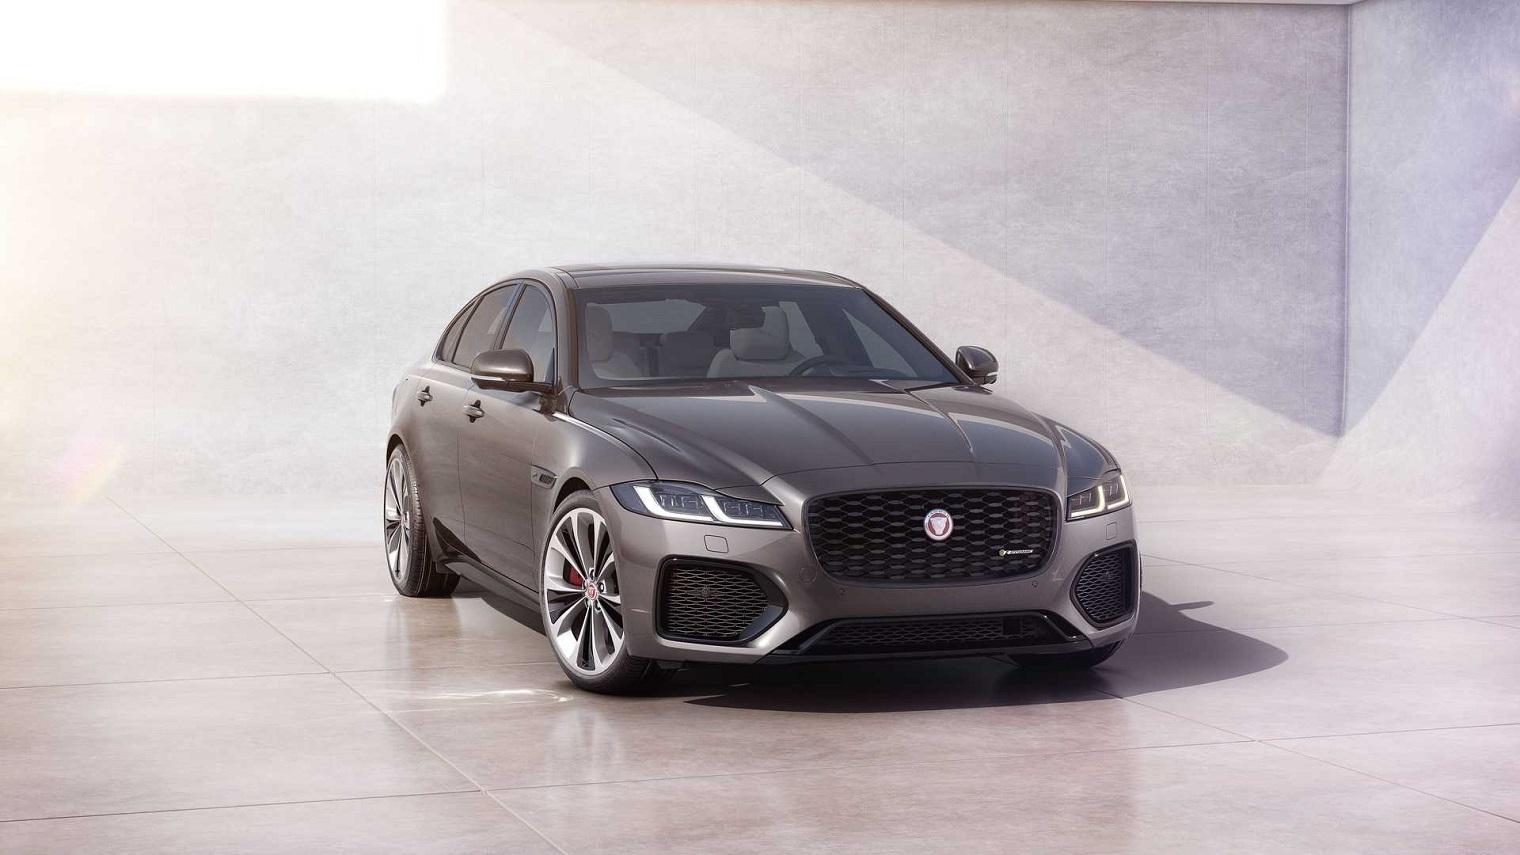 nuova Jaguar XF 2021